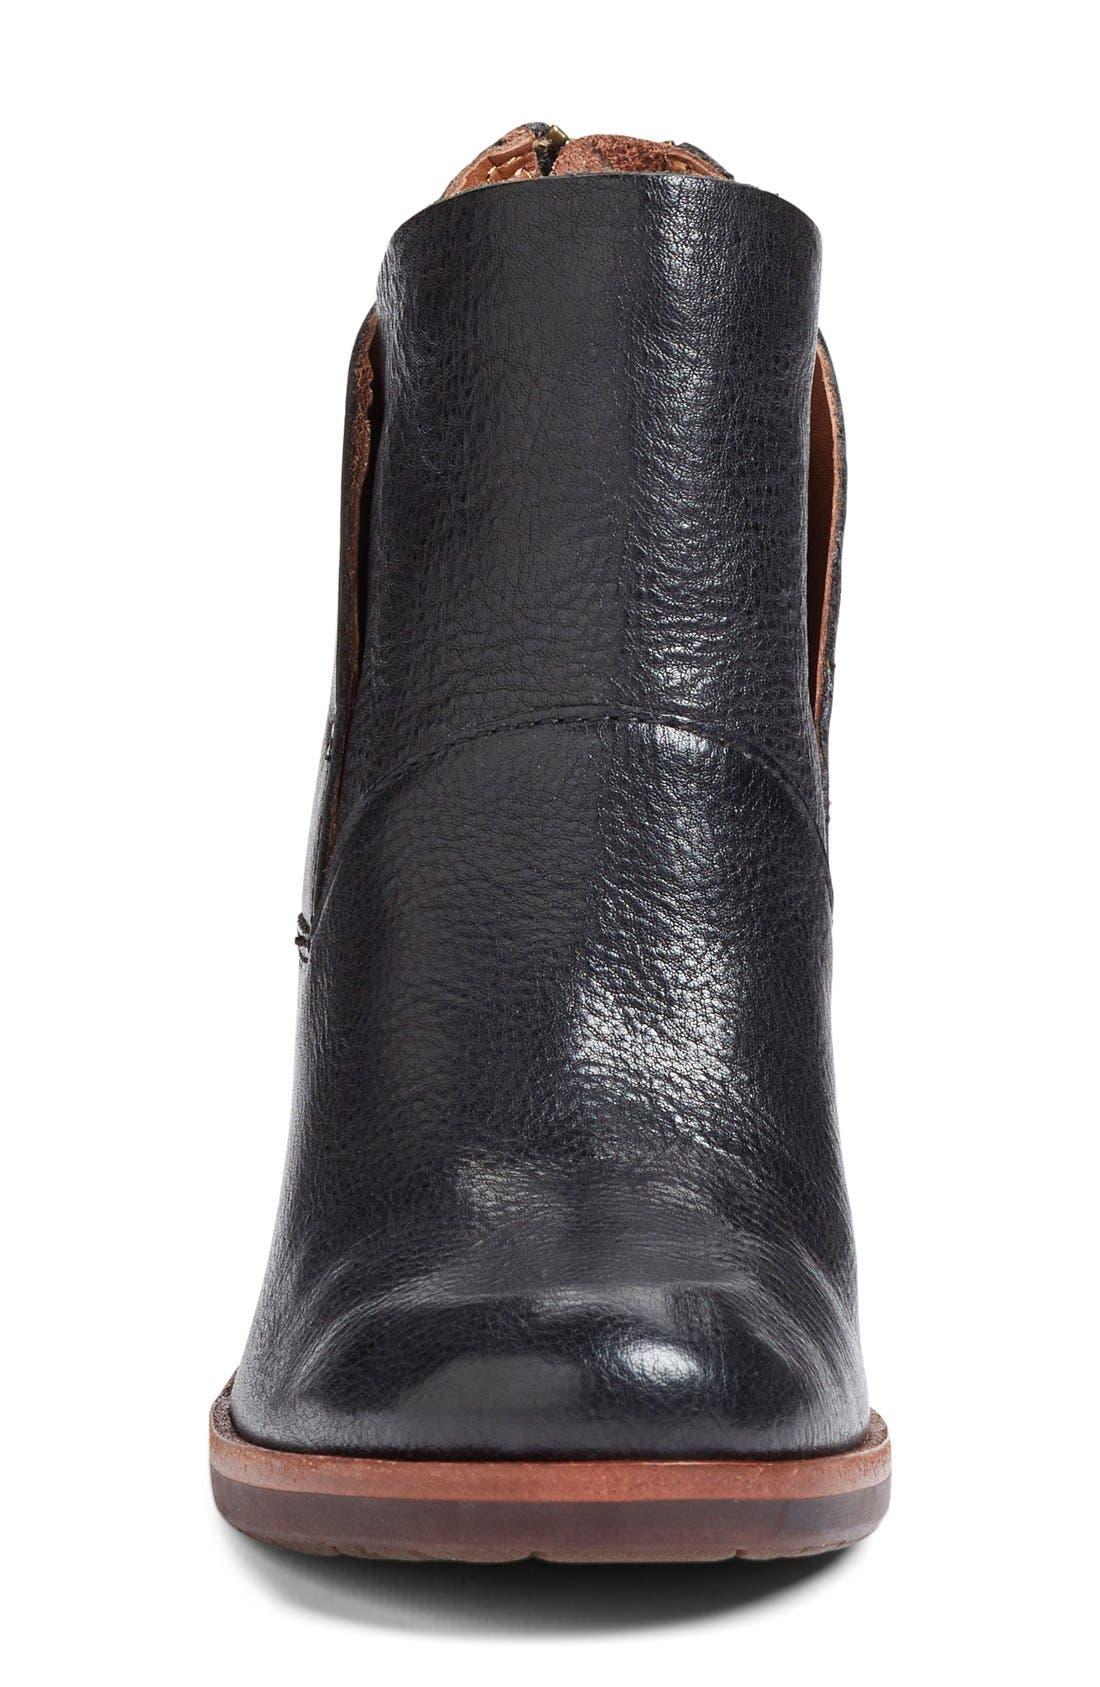 Kork-Ease<sup>™</sup> 'Castaneda'  Boot,                             Alternate thumbnail 9, color,                             001